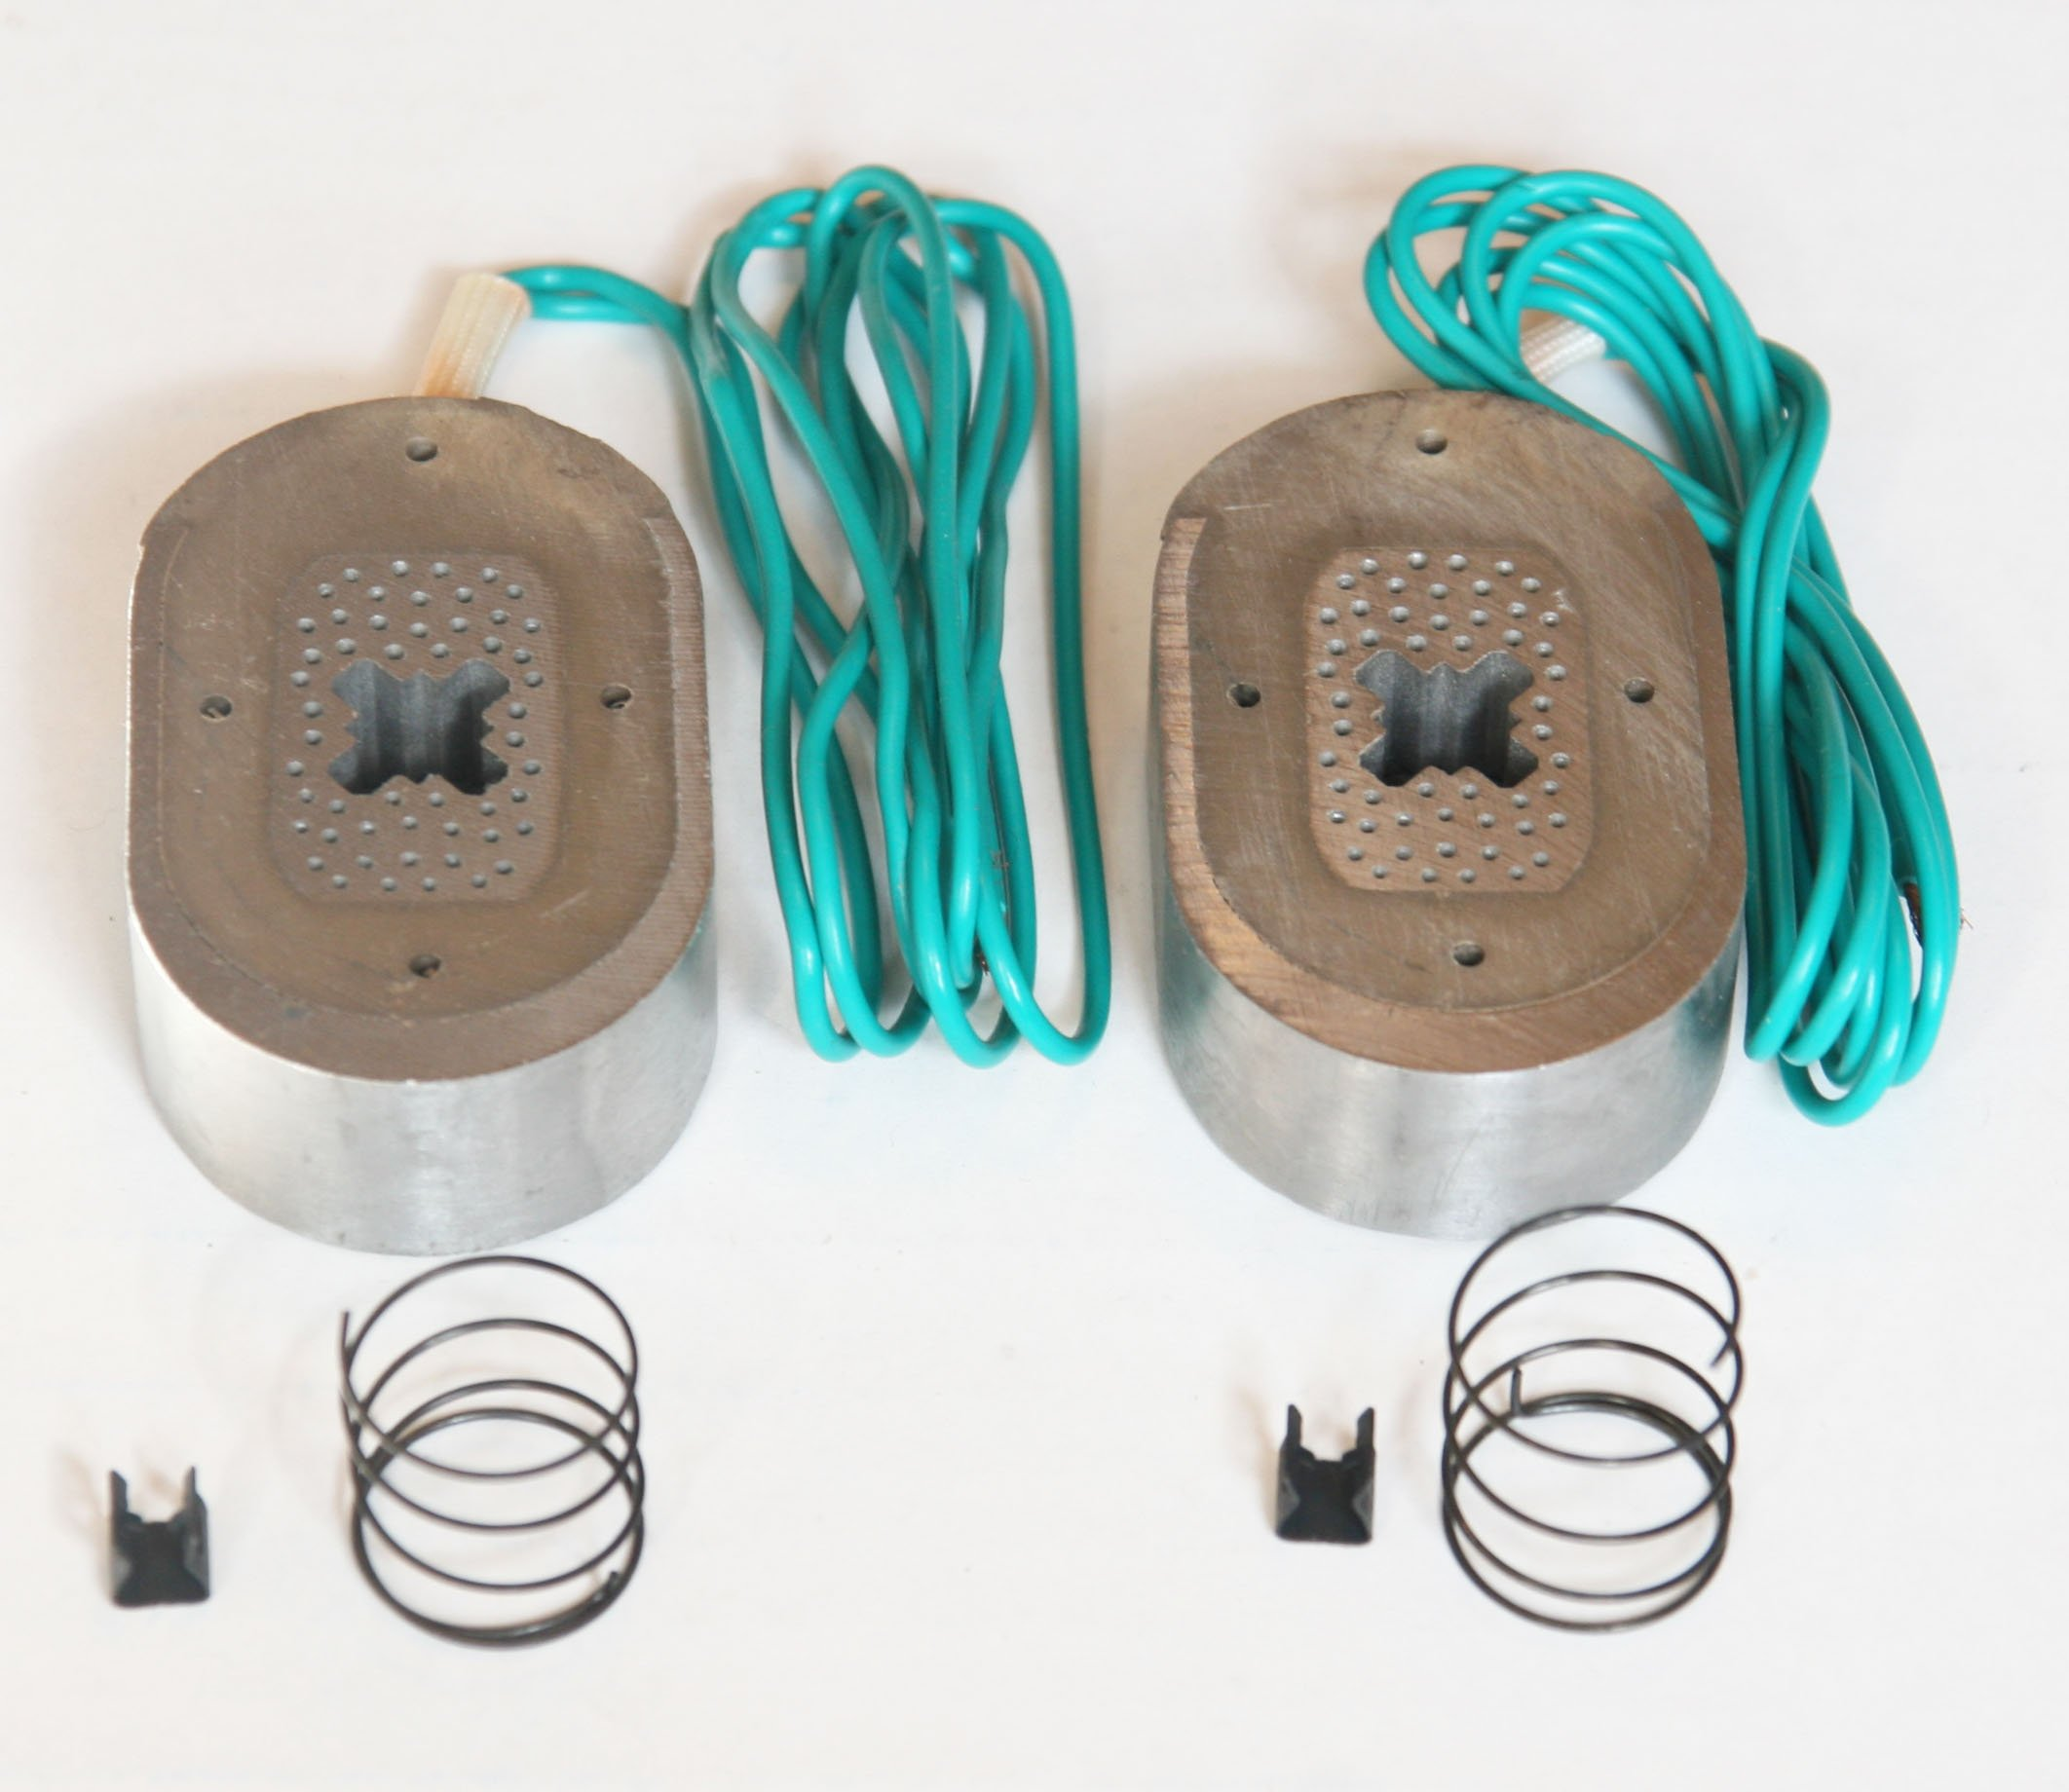 LIBRA Two 10'' Electric Trailer Brake Magnet Replacement Kits - 21024 by LIBRA